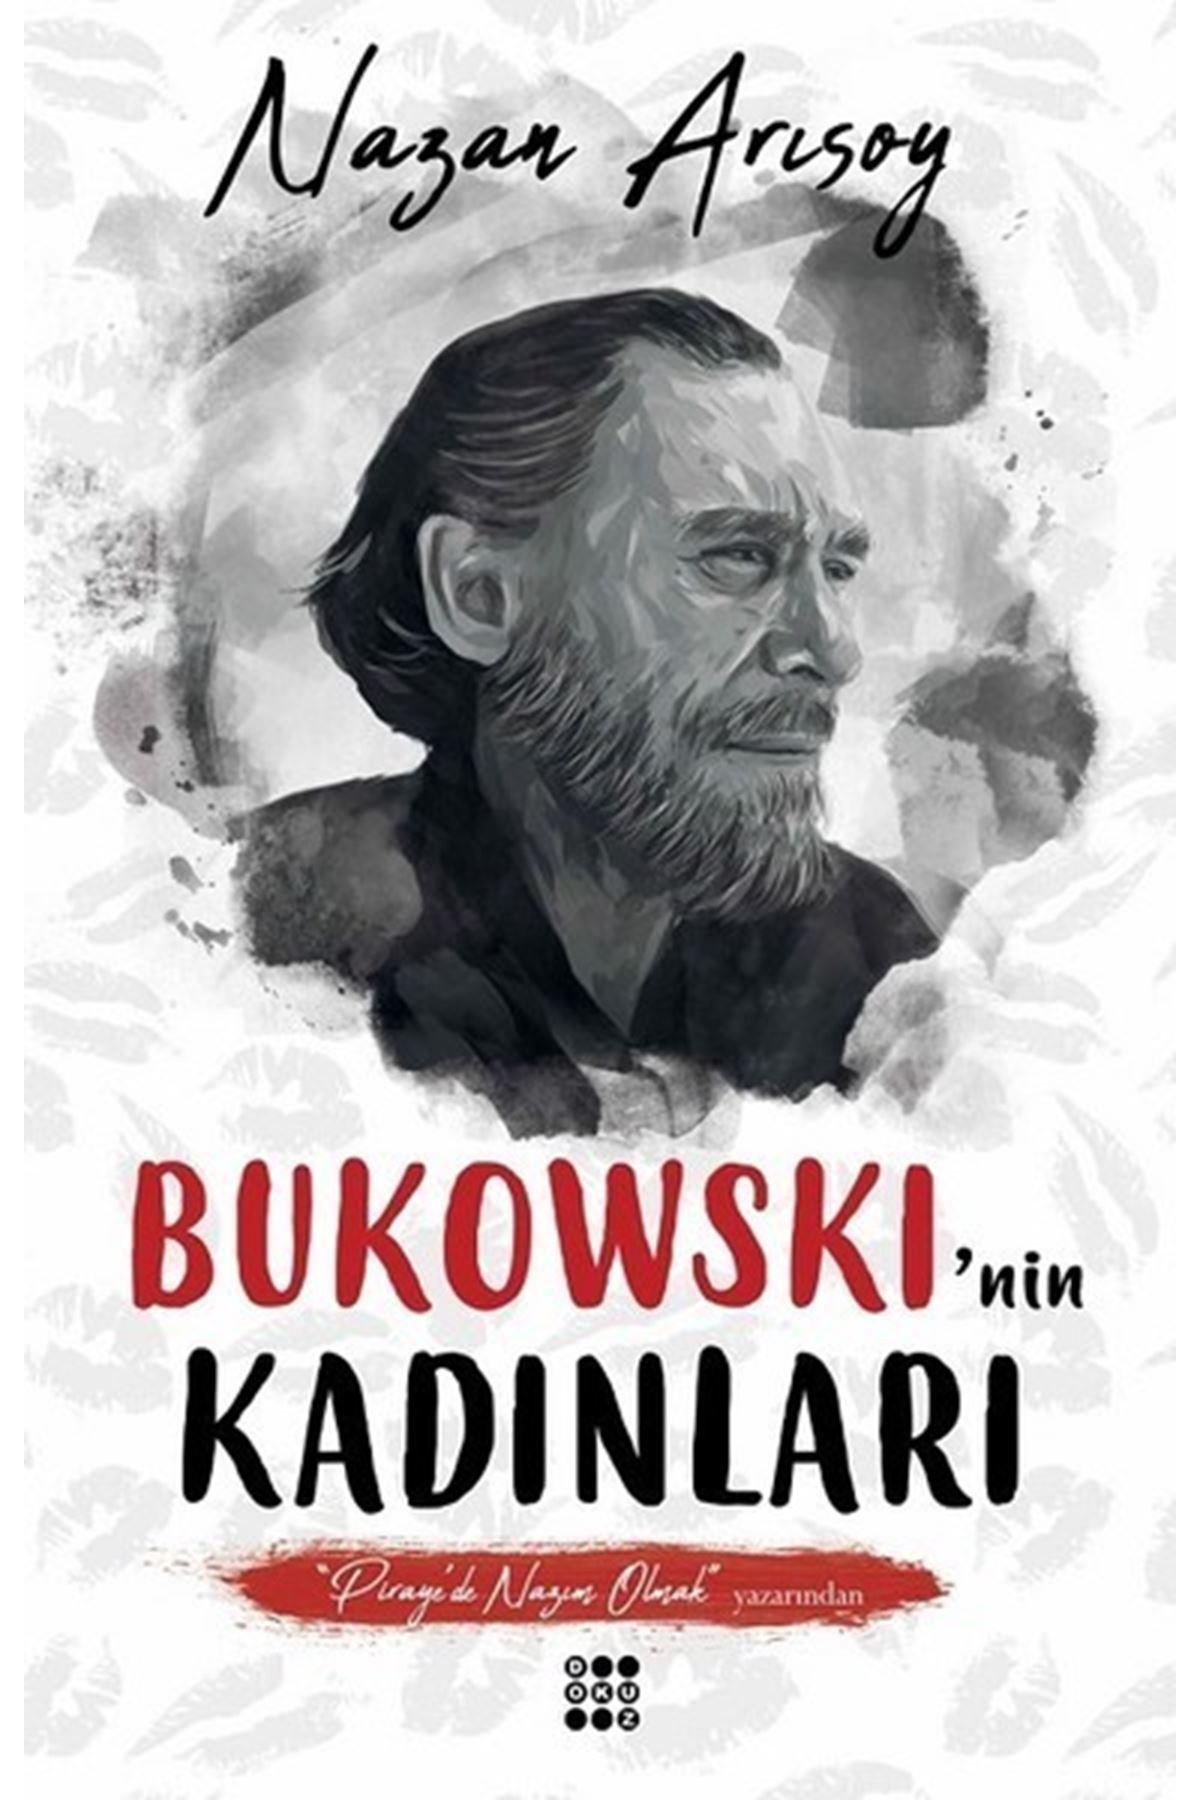 NAZAN ARISOY - BUKOWSKI'NİN KADINLARI